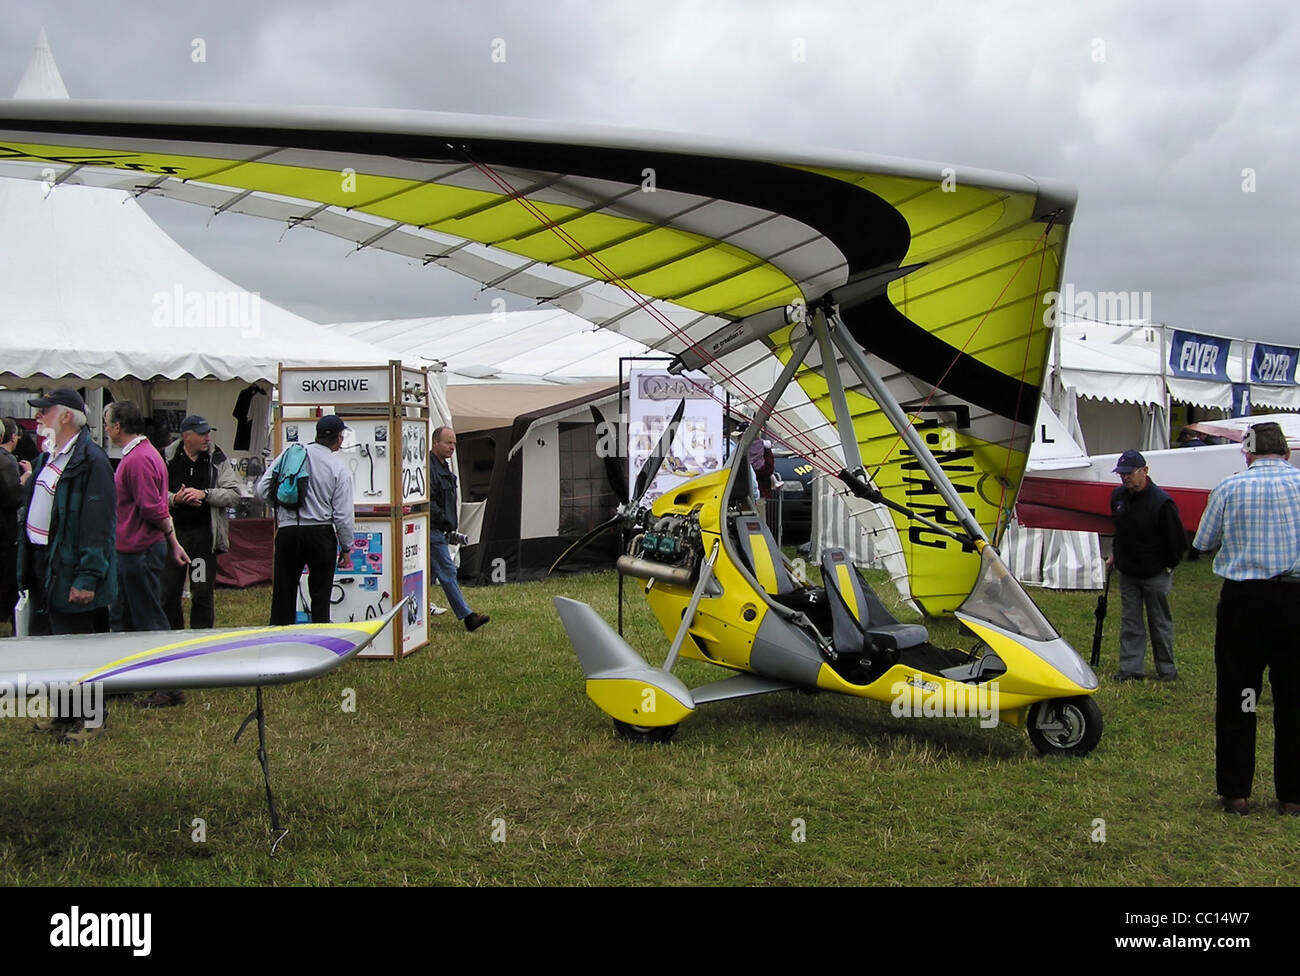 Tanarg/Ixess 15 912S(1) hang glider (G-NARG) at a Popular Flying